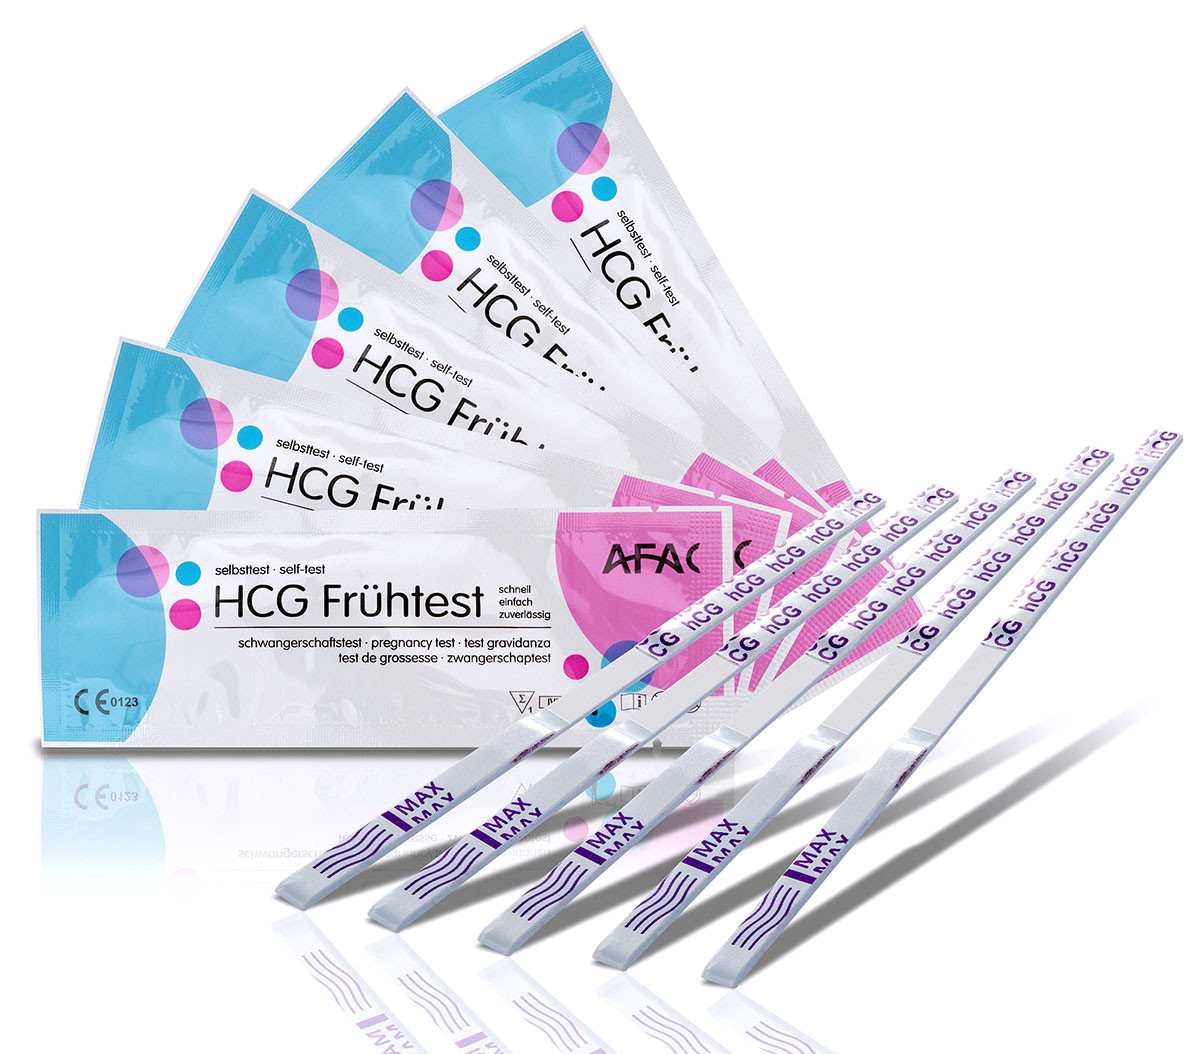 20 x AFAC Schwangerschaftstests (Frühtest) 10 miu/ml + 1 Urinprobebecher